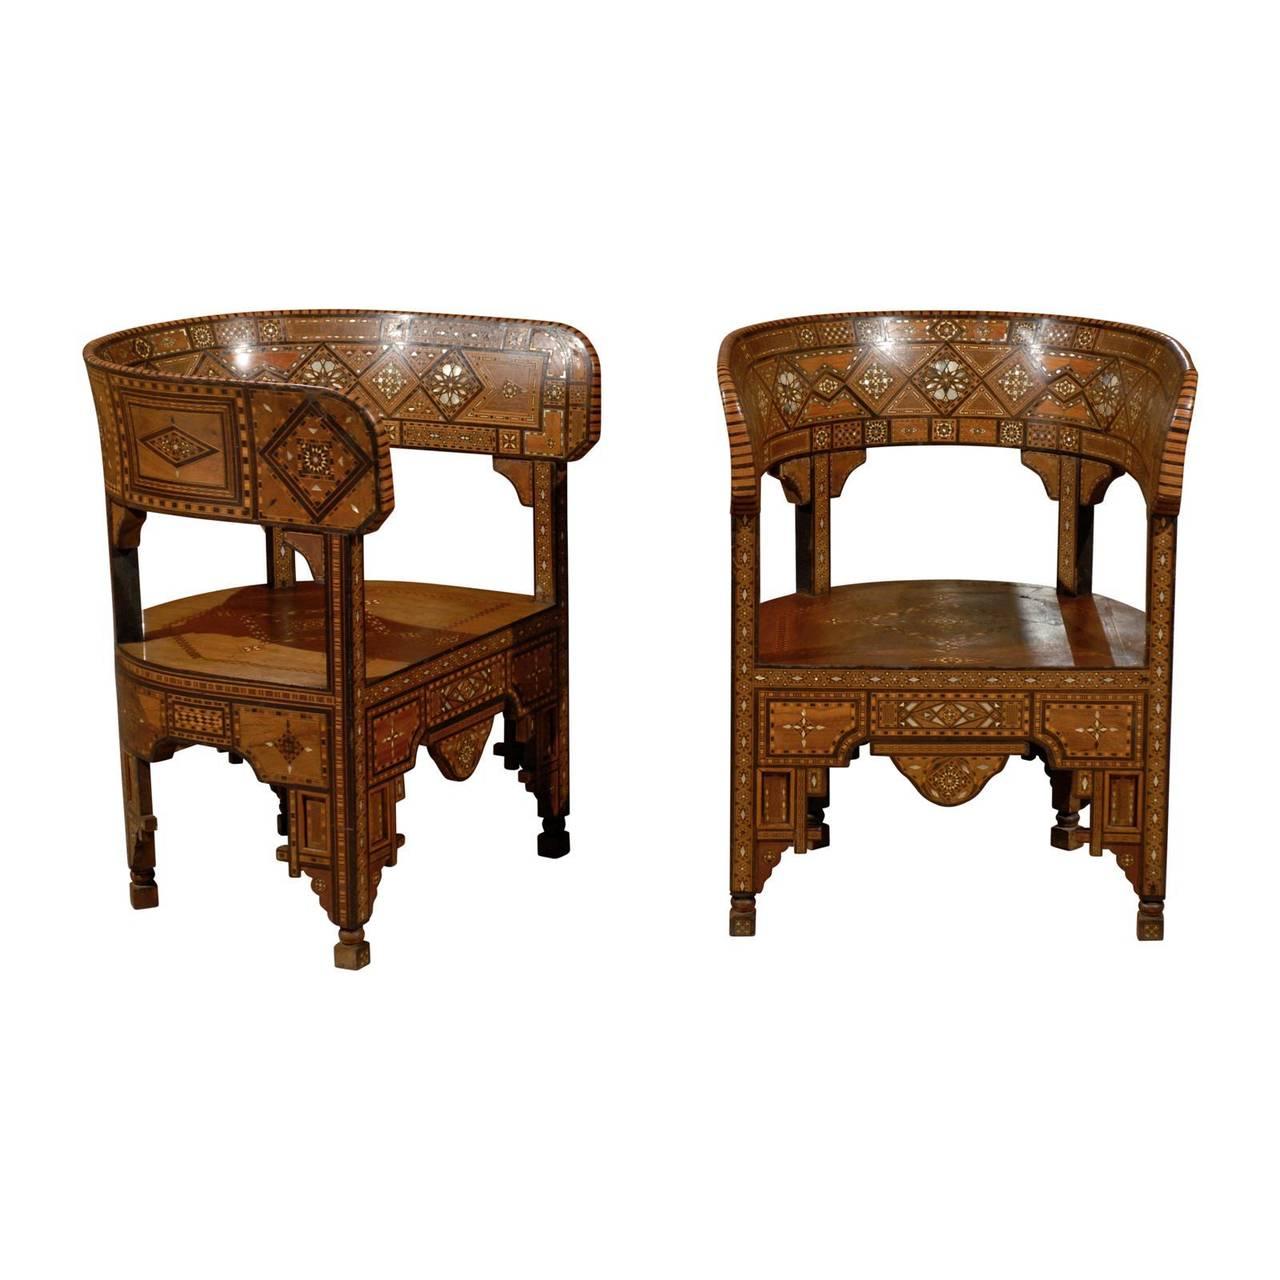 Antika Suriye Sandalyesi